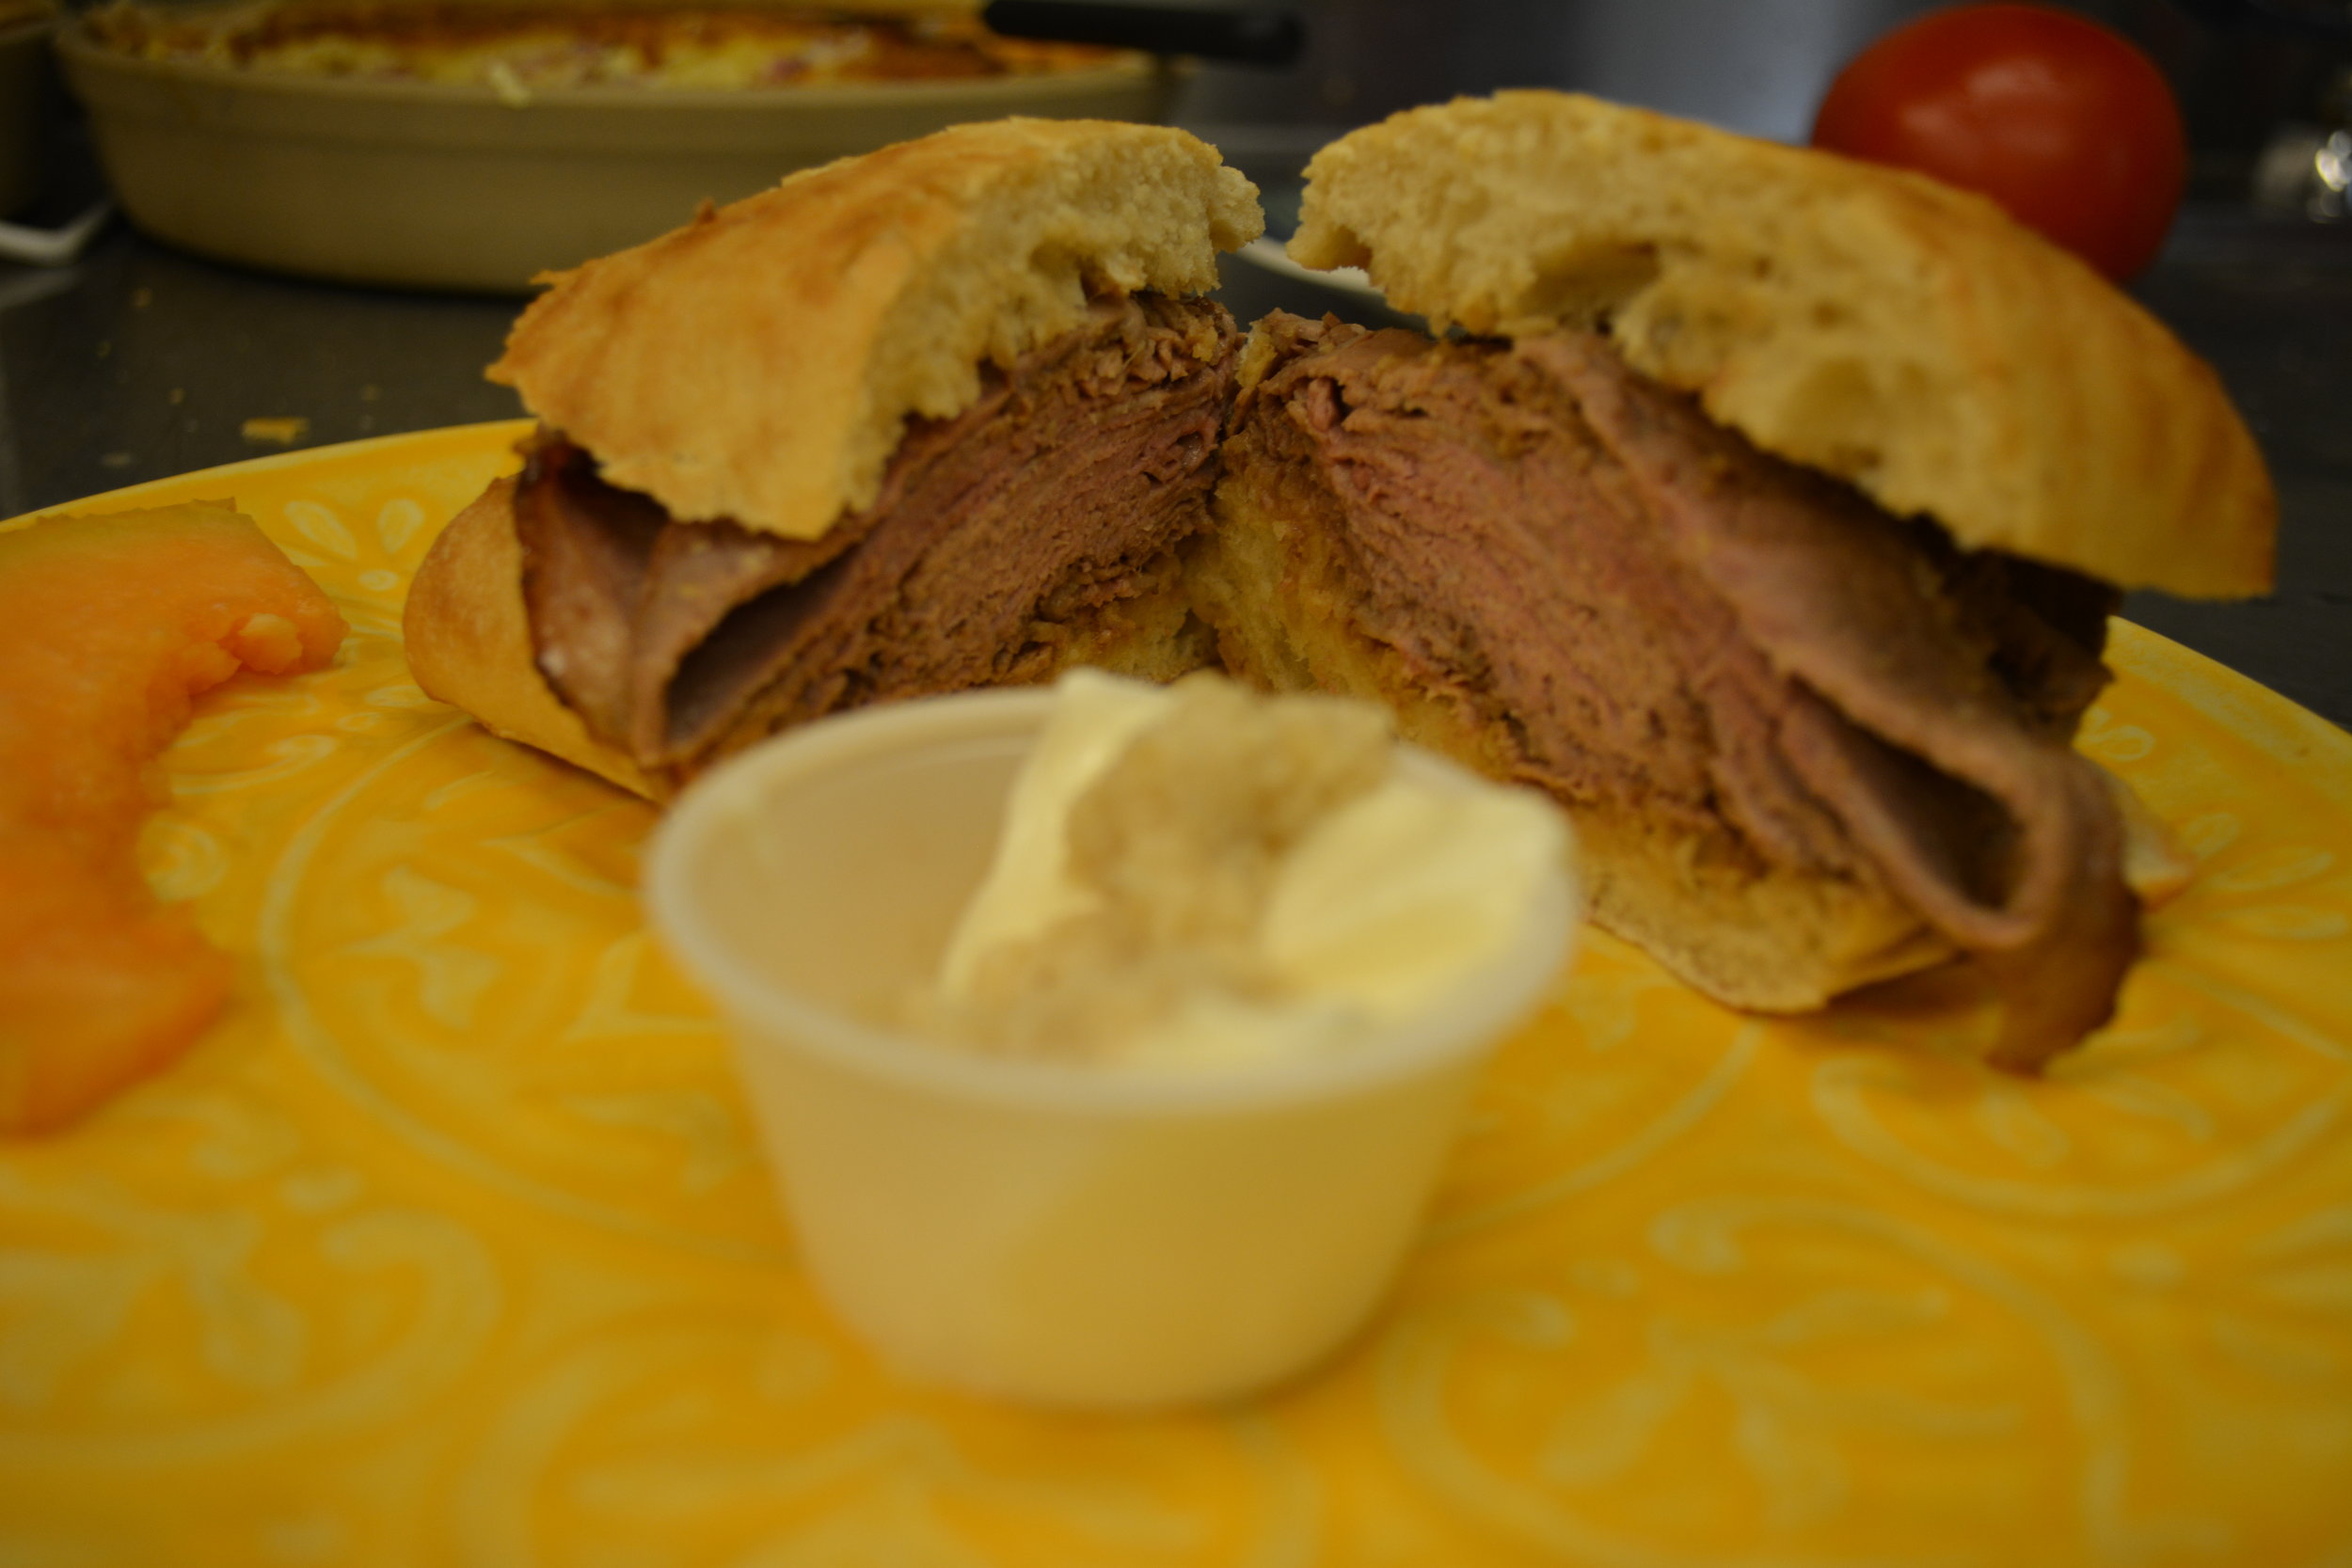 Tashko's Roast Beef - Slow cooked Black Angus roast beef sliced and piled high, with horseradish & mayonnaise on side